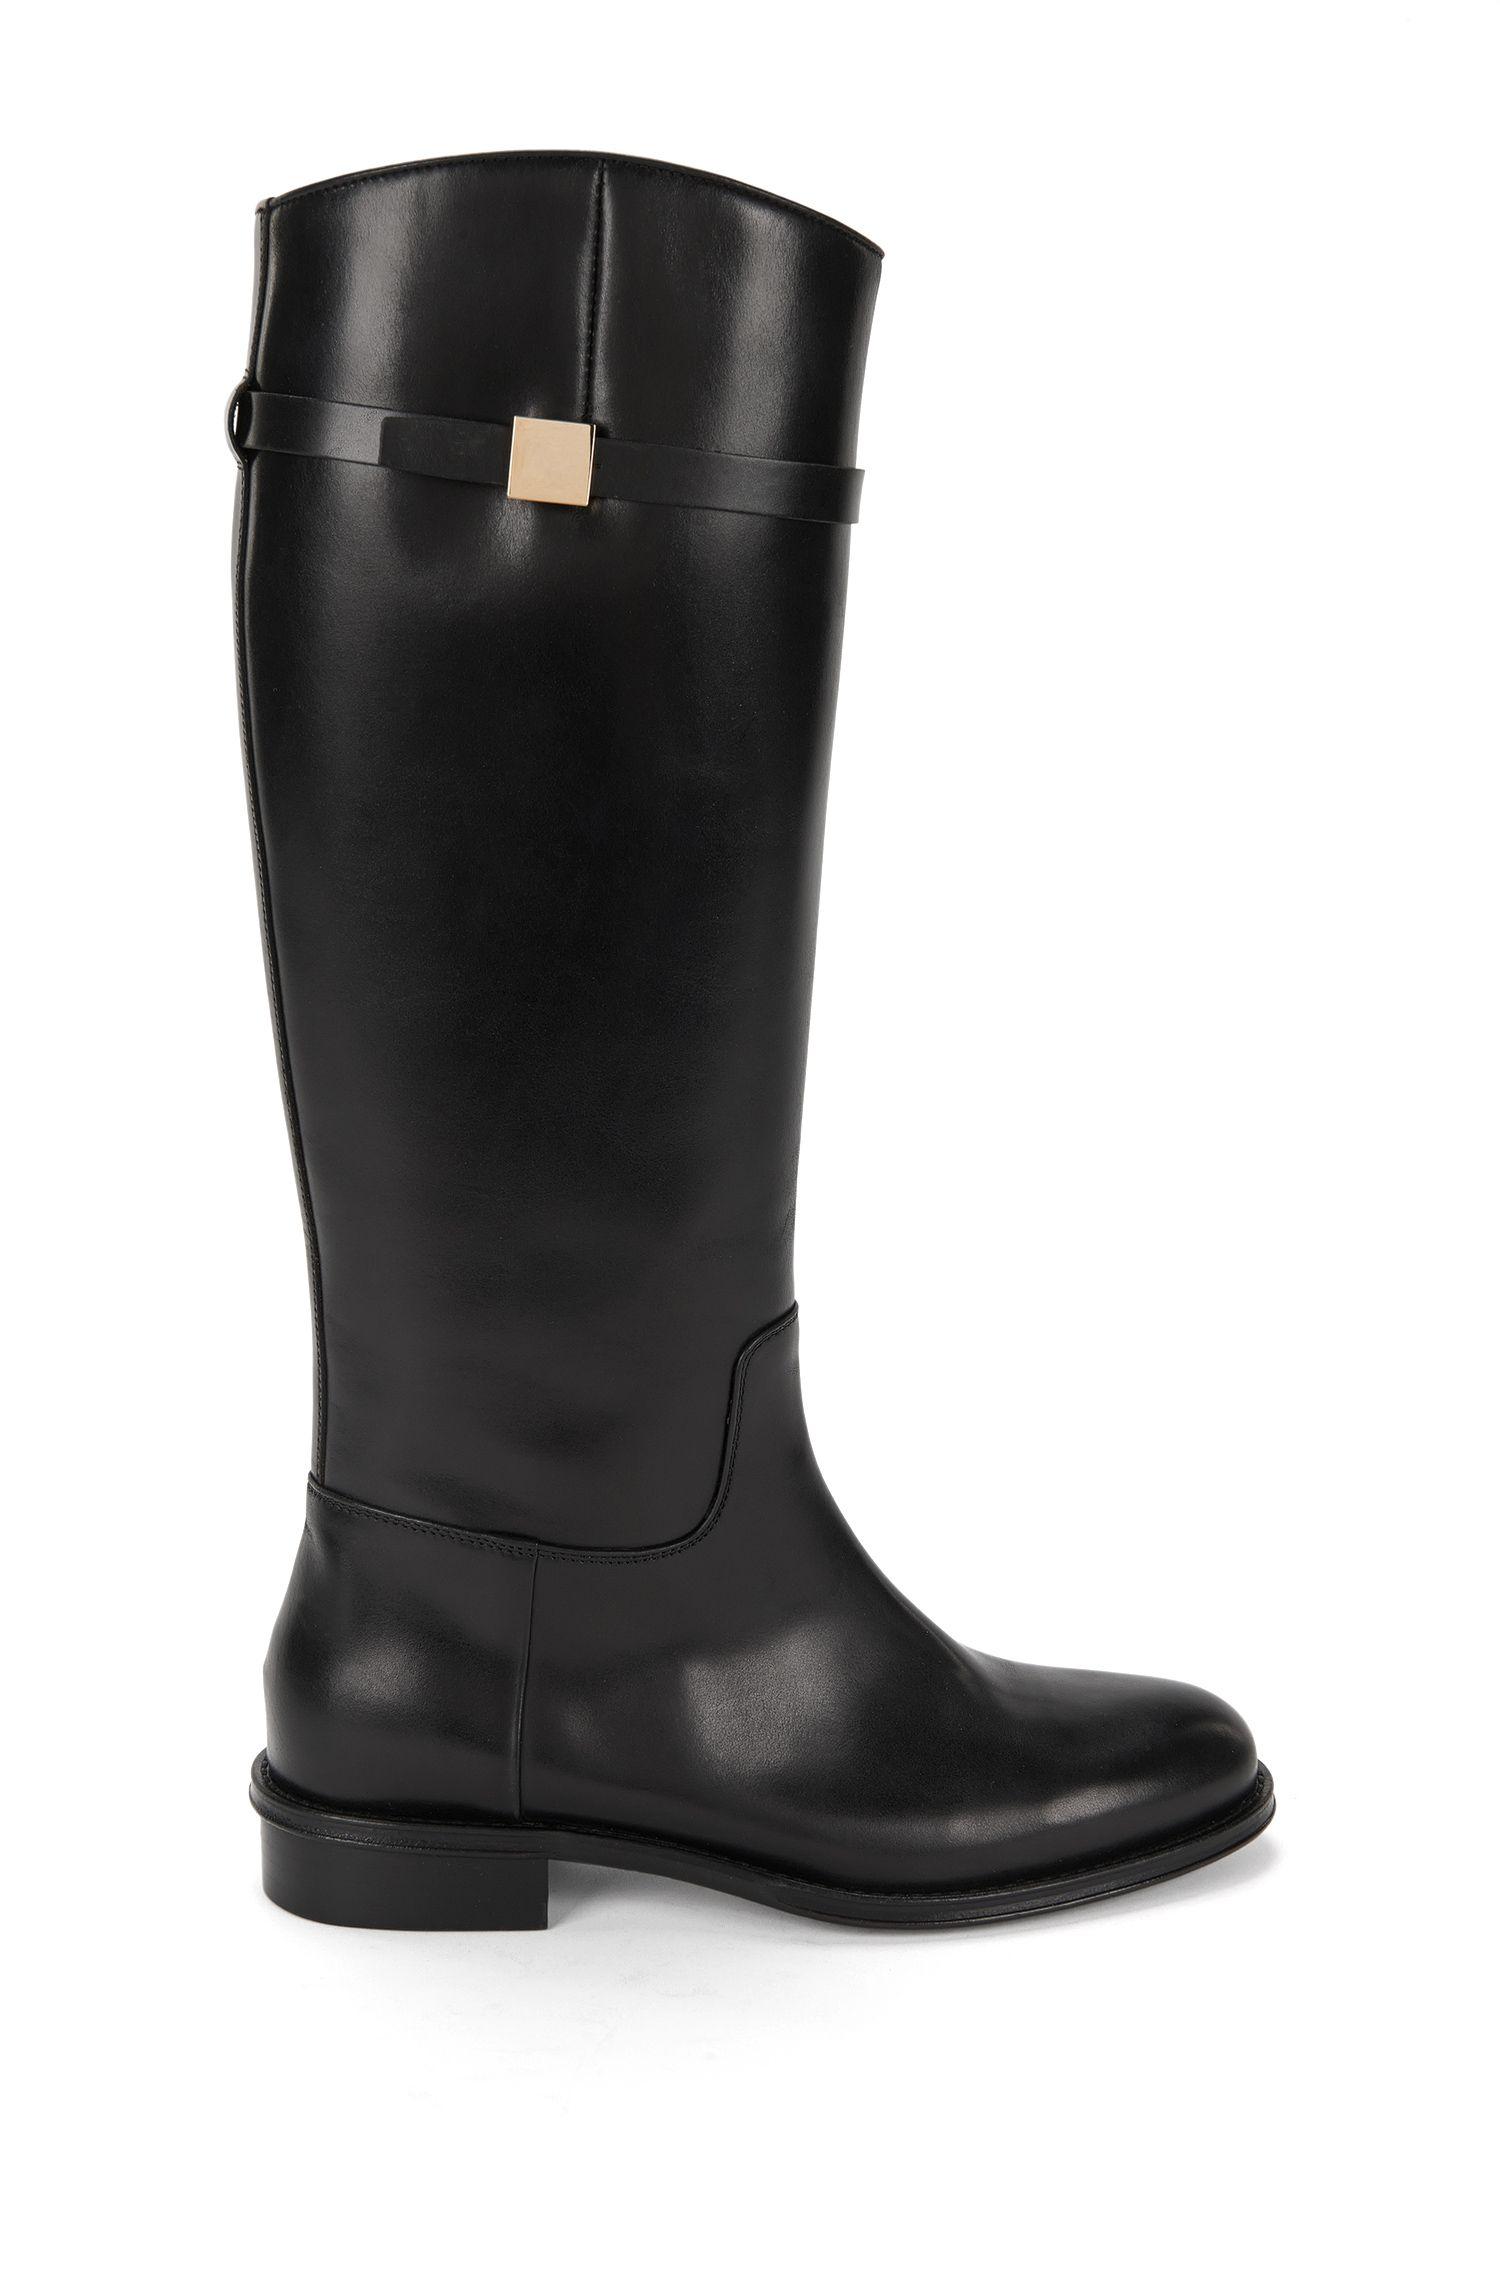 'Pin Riding Boot' | Italian Calfskin Riding Boot